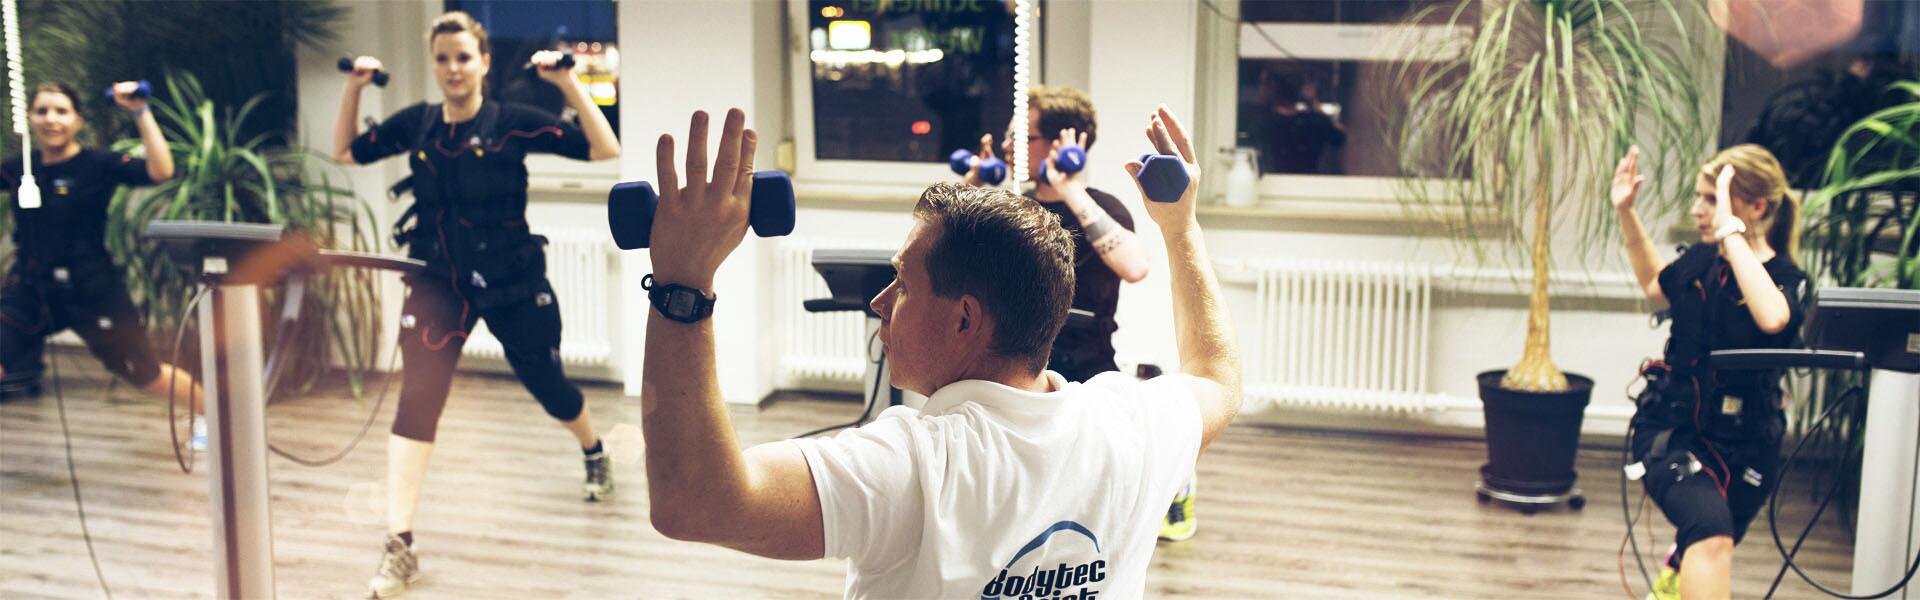 philosophie bodytecpoint miha bodytec ems training in n rnberg. Black Bedroom Furniture Sets. Home Design Ideas